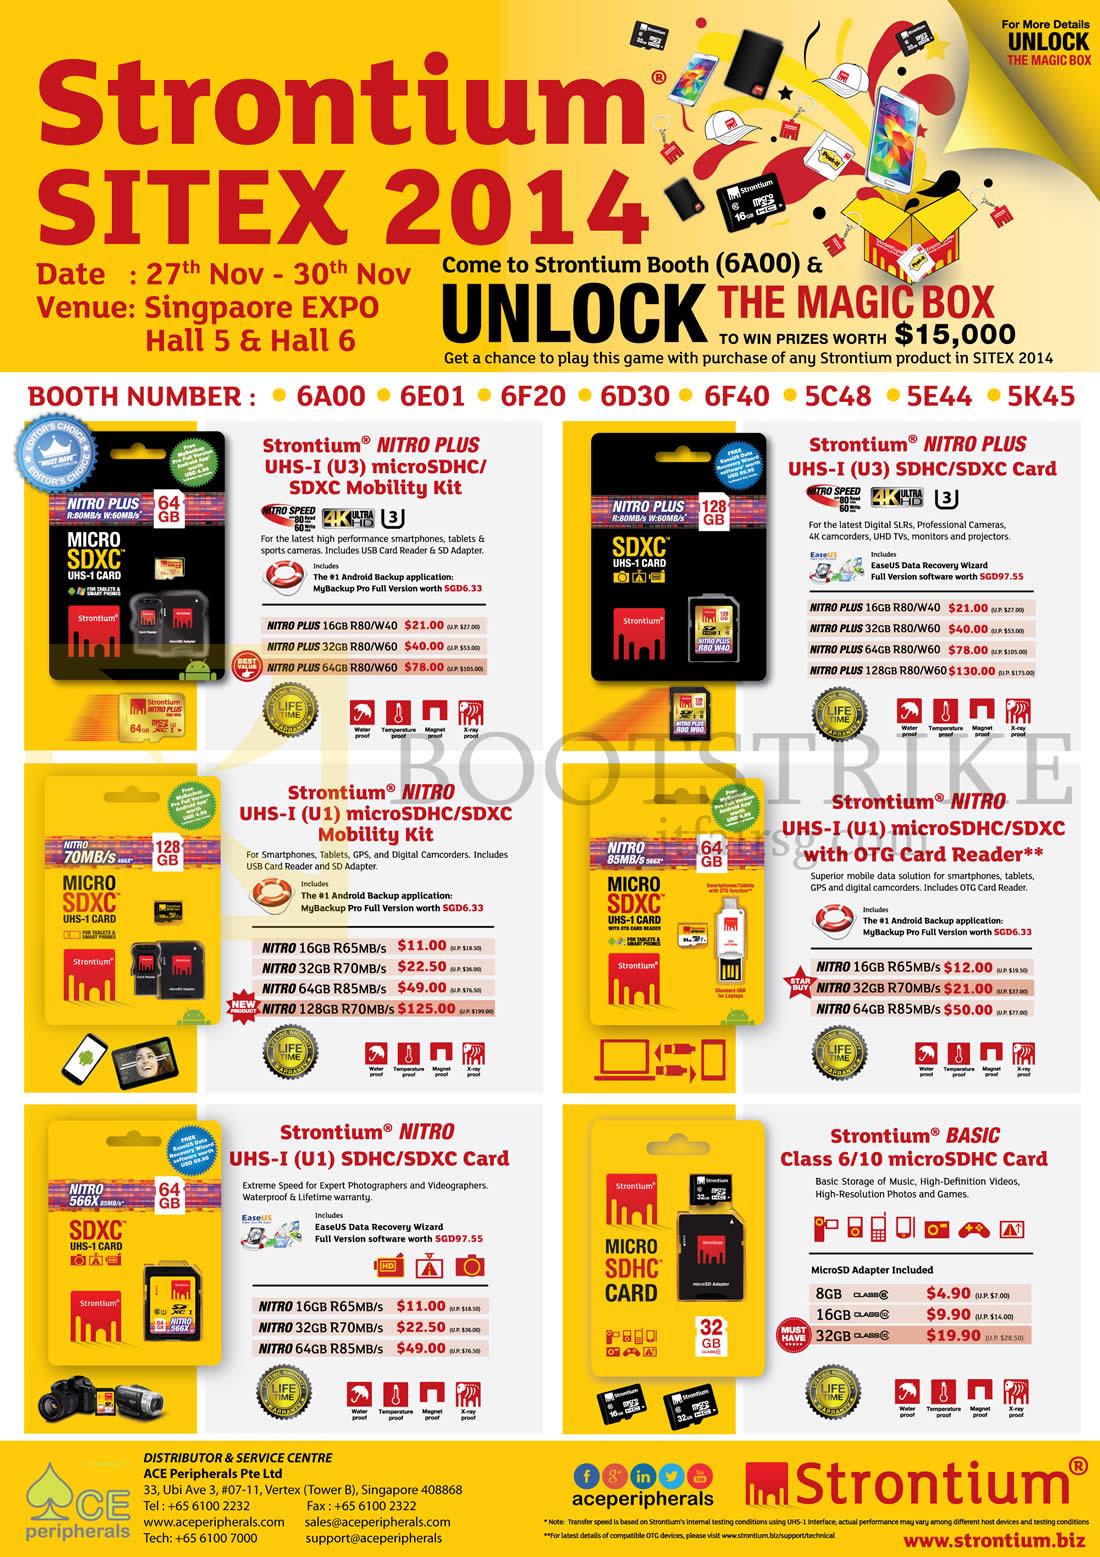 SITEX 2014 price list image brochure of Strontium Nitro Plus UHS 1, U1, U3, MicroSDHD SDXC Mobility Kit, OTG Card Reader Class 6, 10